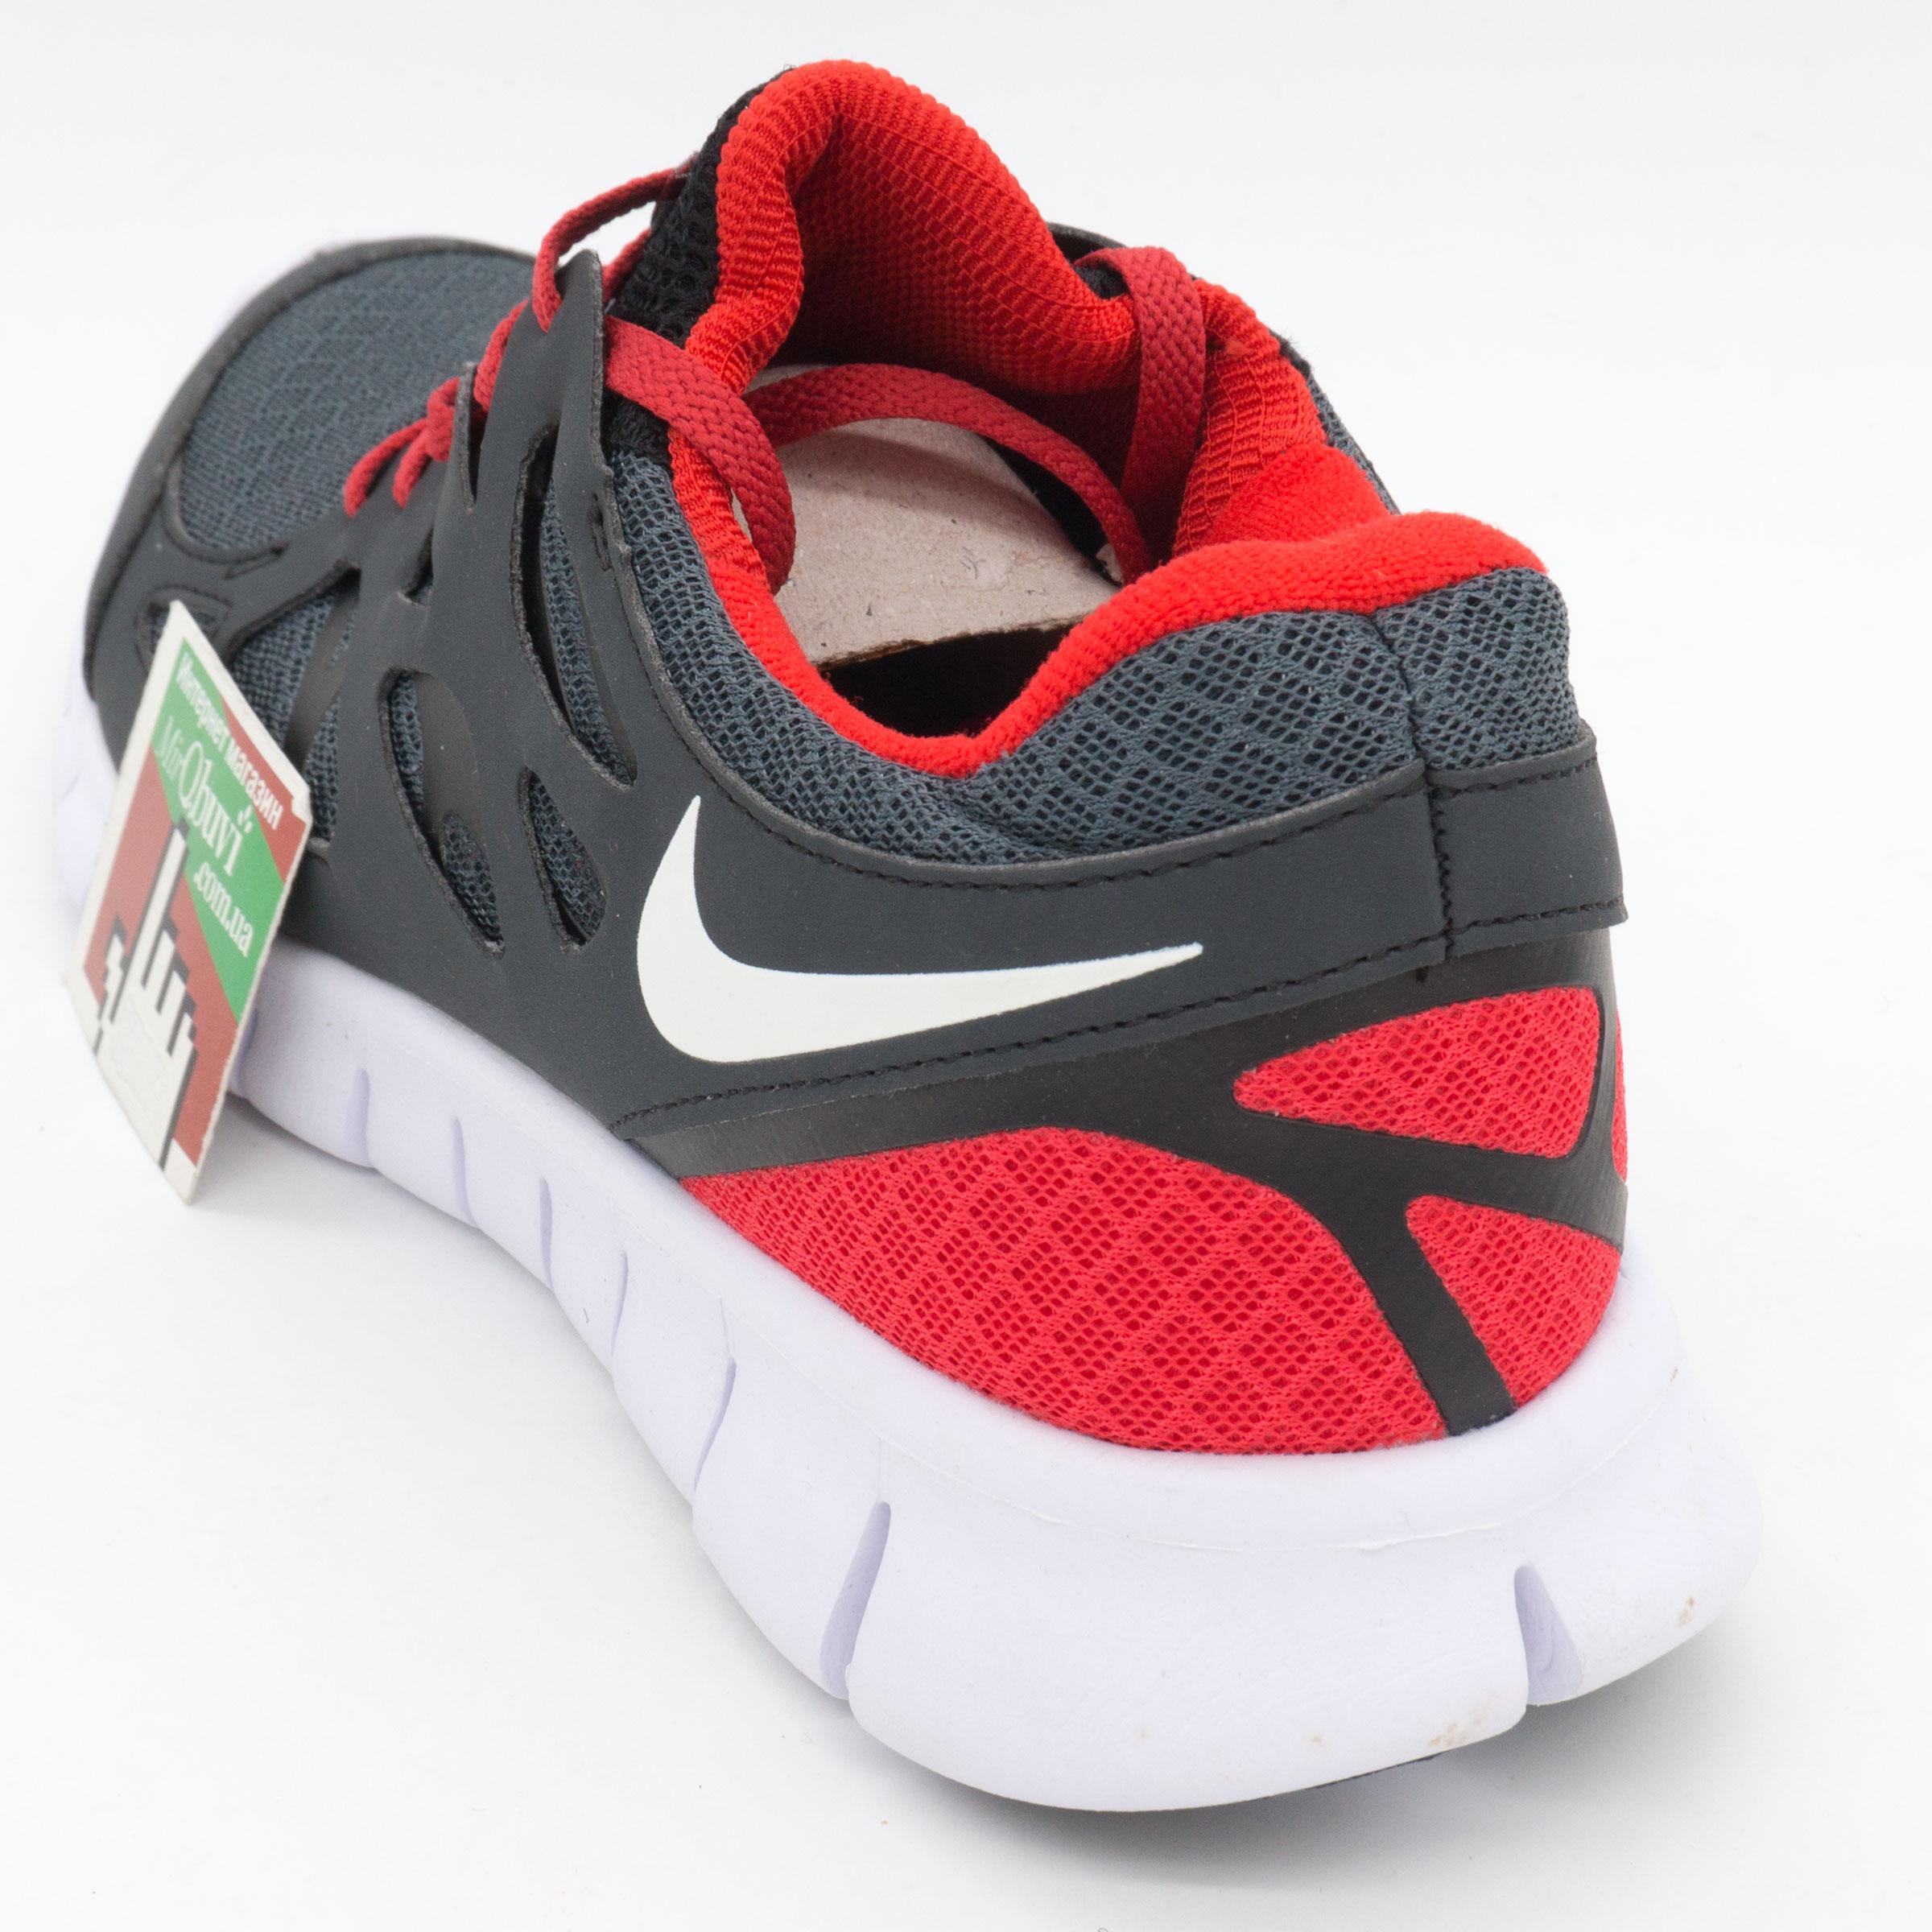 фото back Кроссовки для бега Nike Free Run 2 Найк Фри Ран, серо-красные back